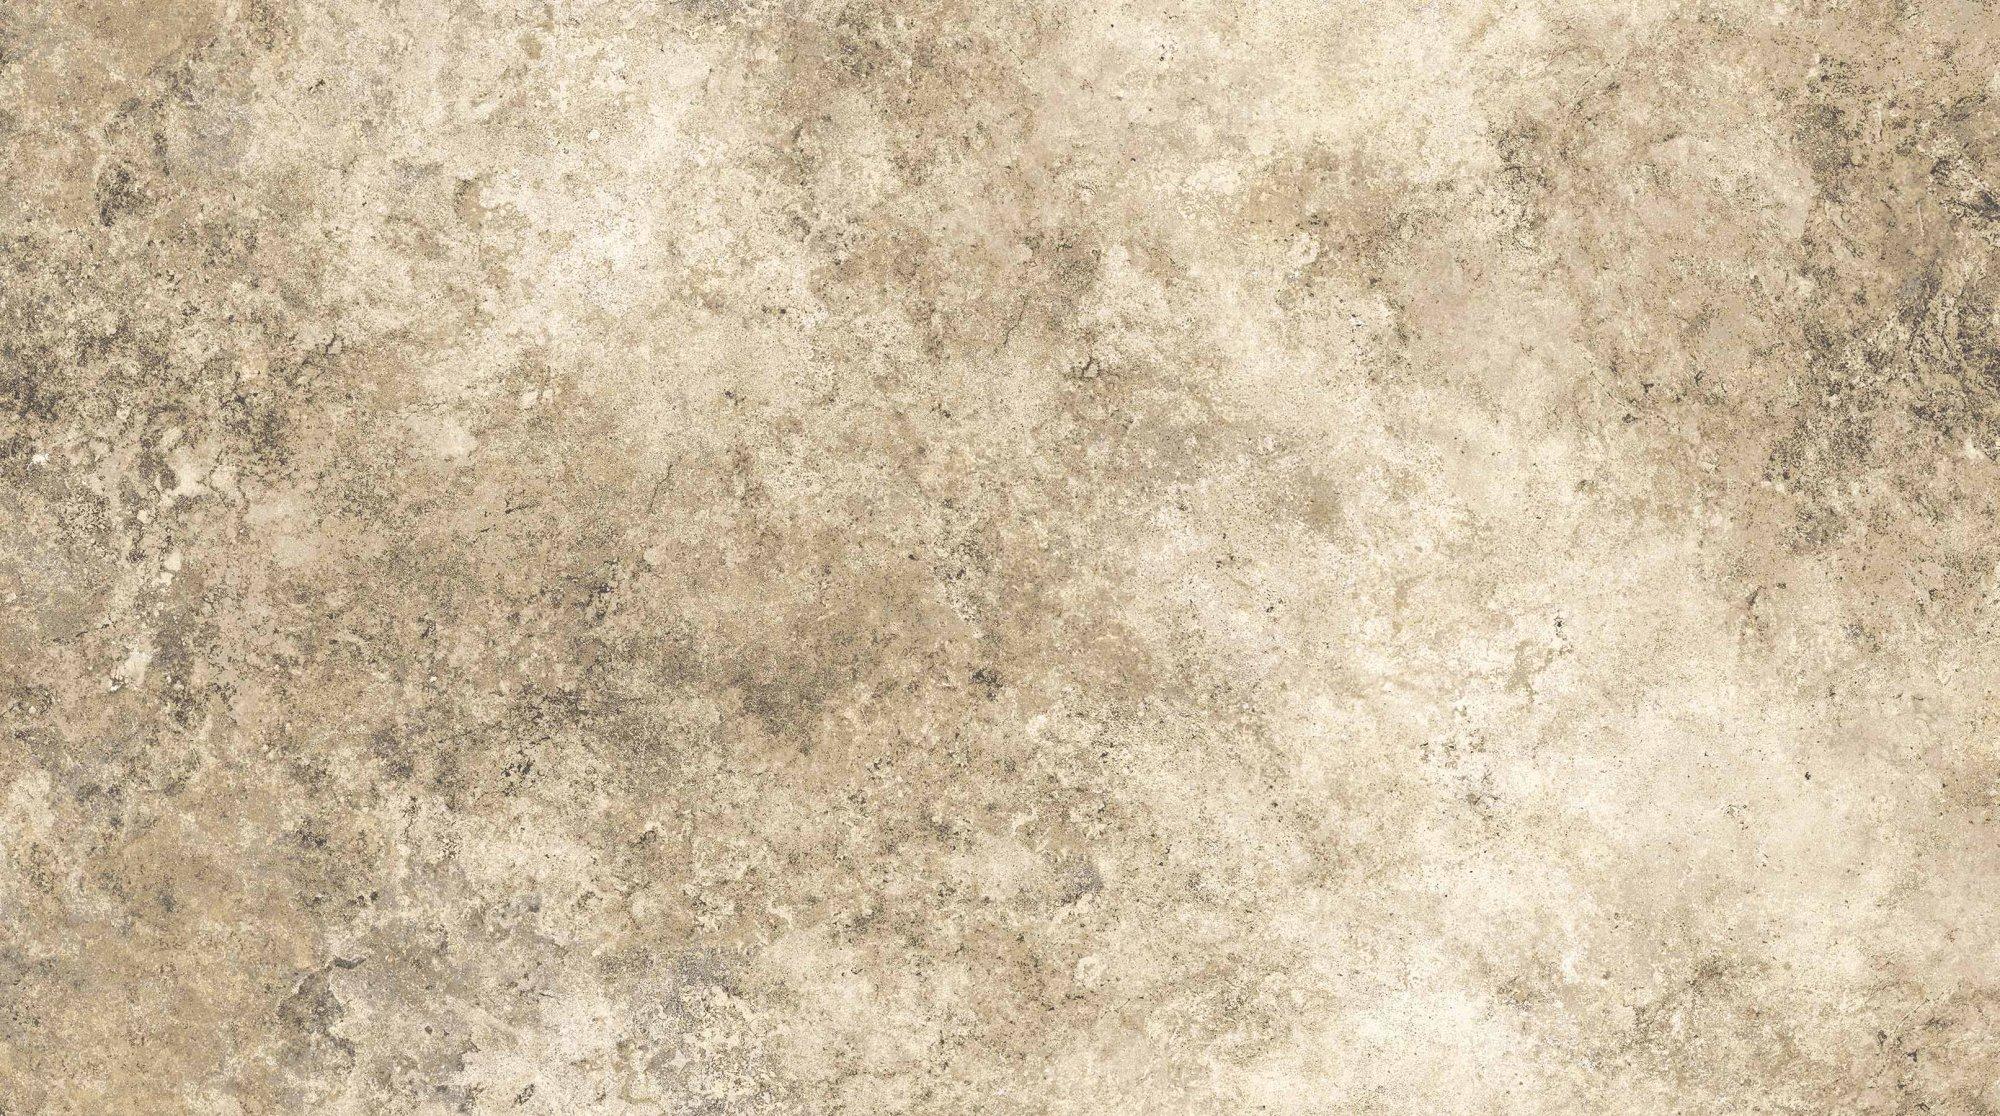 39382-14 Desert Gradation Mixers Stonehenge